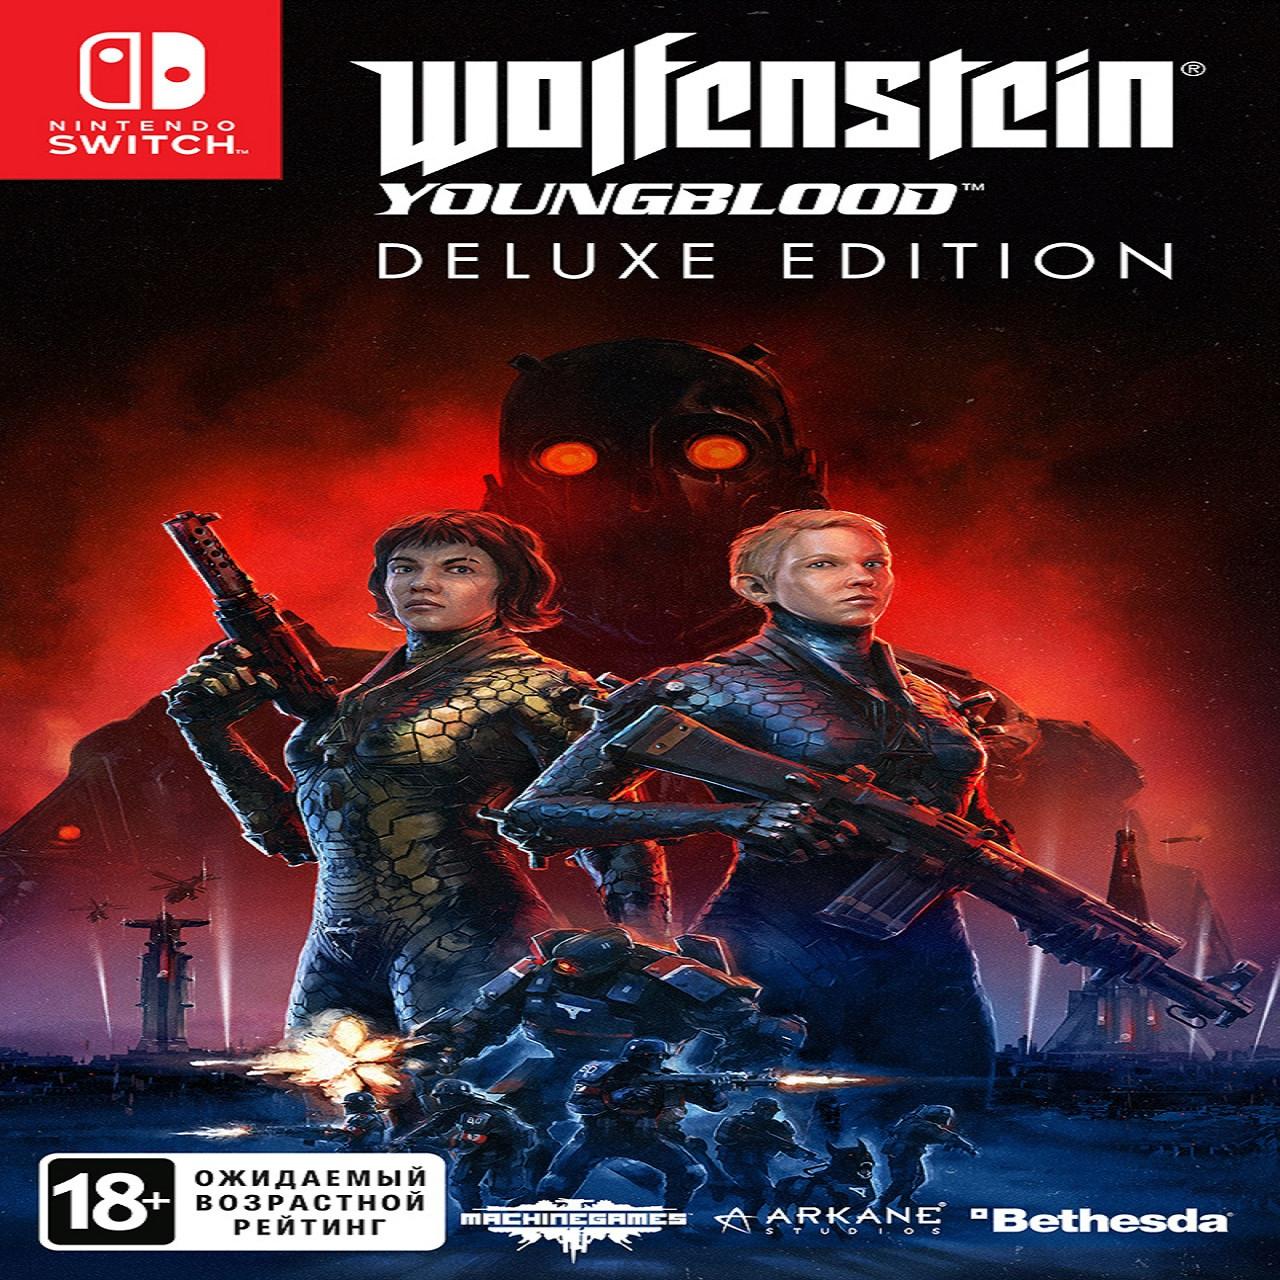 Wolfenstein: Youngblood Deluxe Edition (російська версія) Nintendo Switch